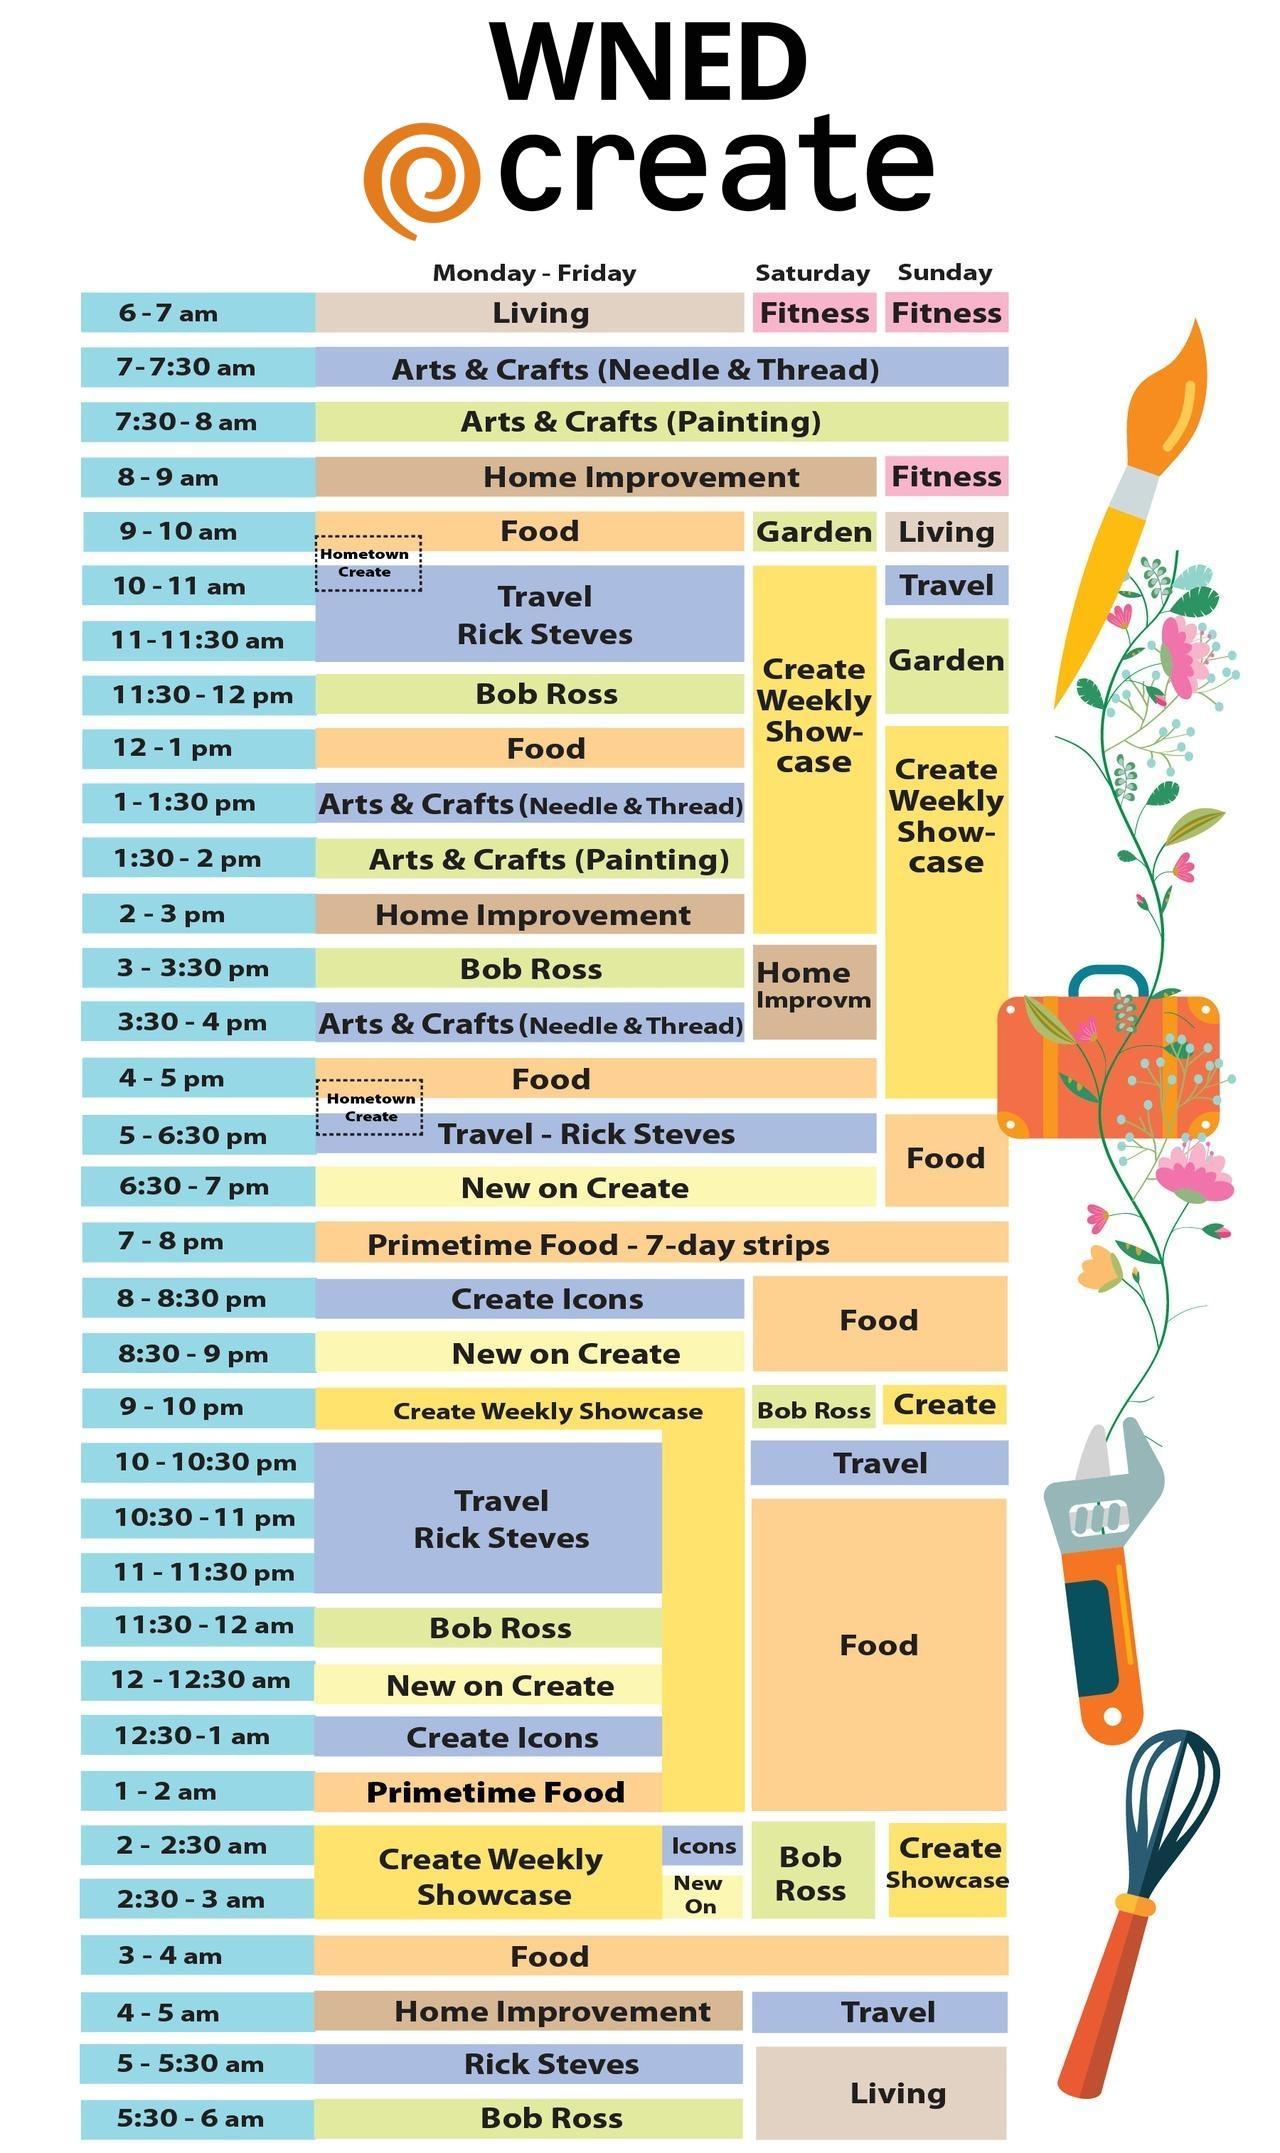 WNED Create Program Schedule